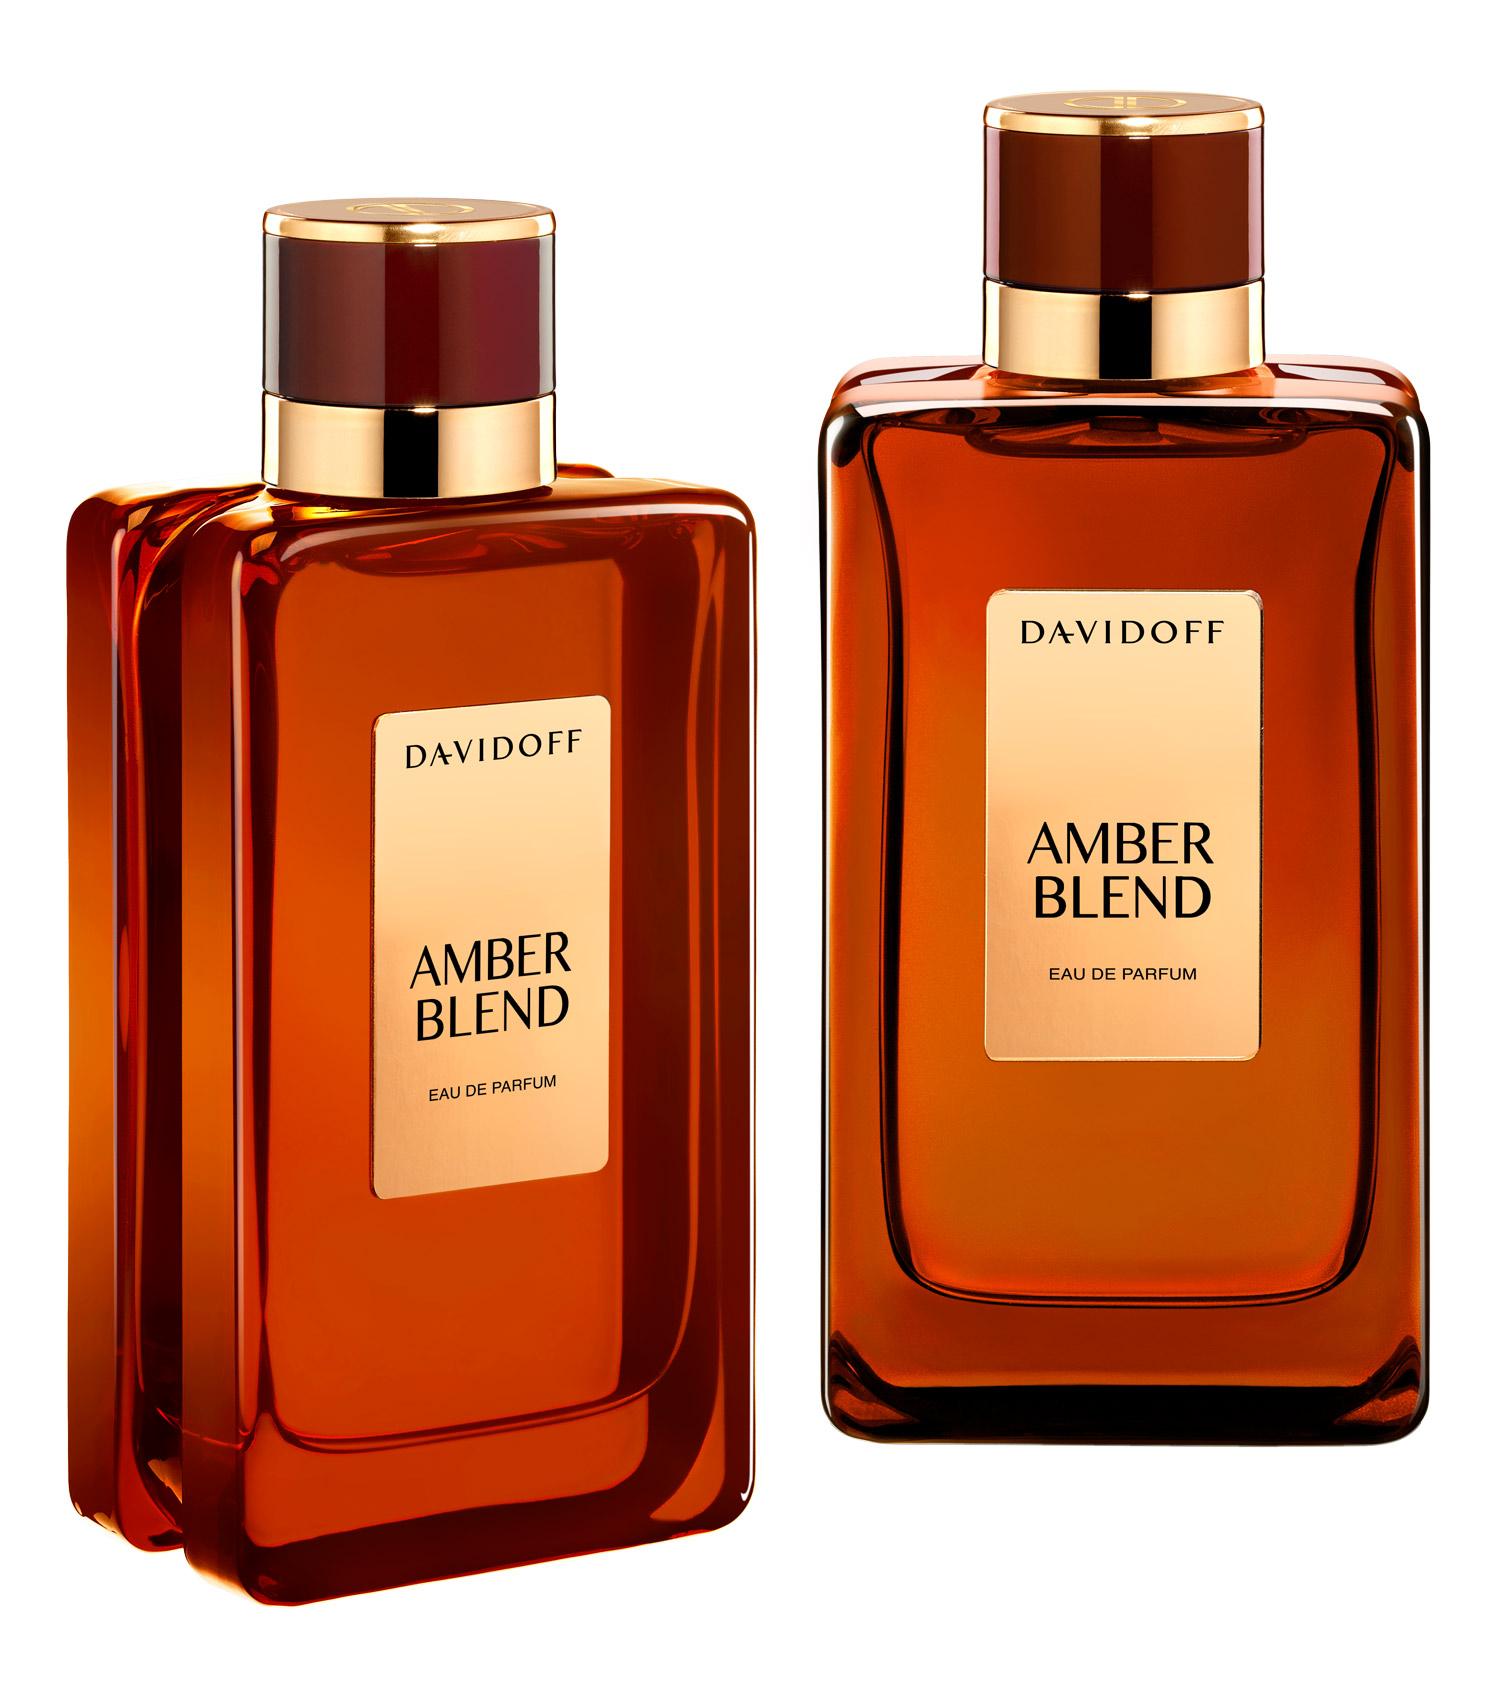 e89640355bd9 Davidoff Blend Collection  Amber Blend ~ Novas fragrâncias